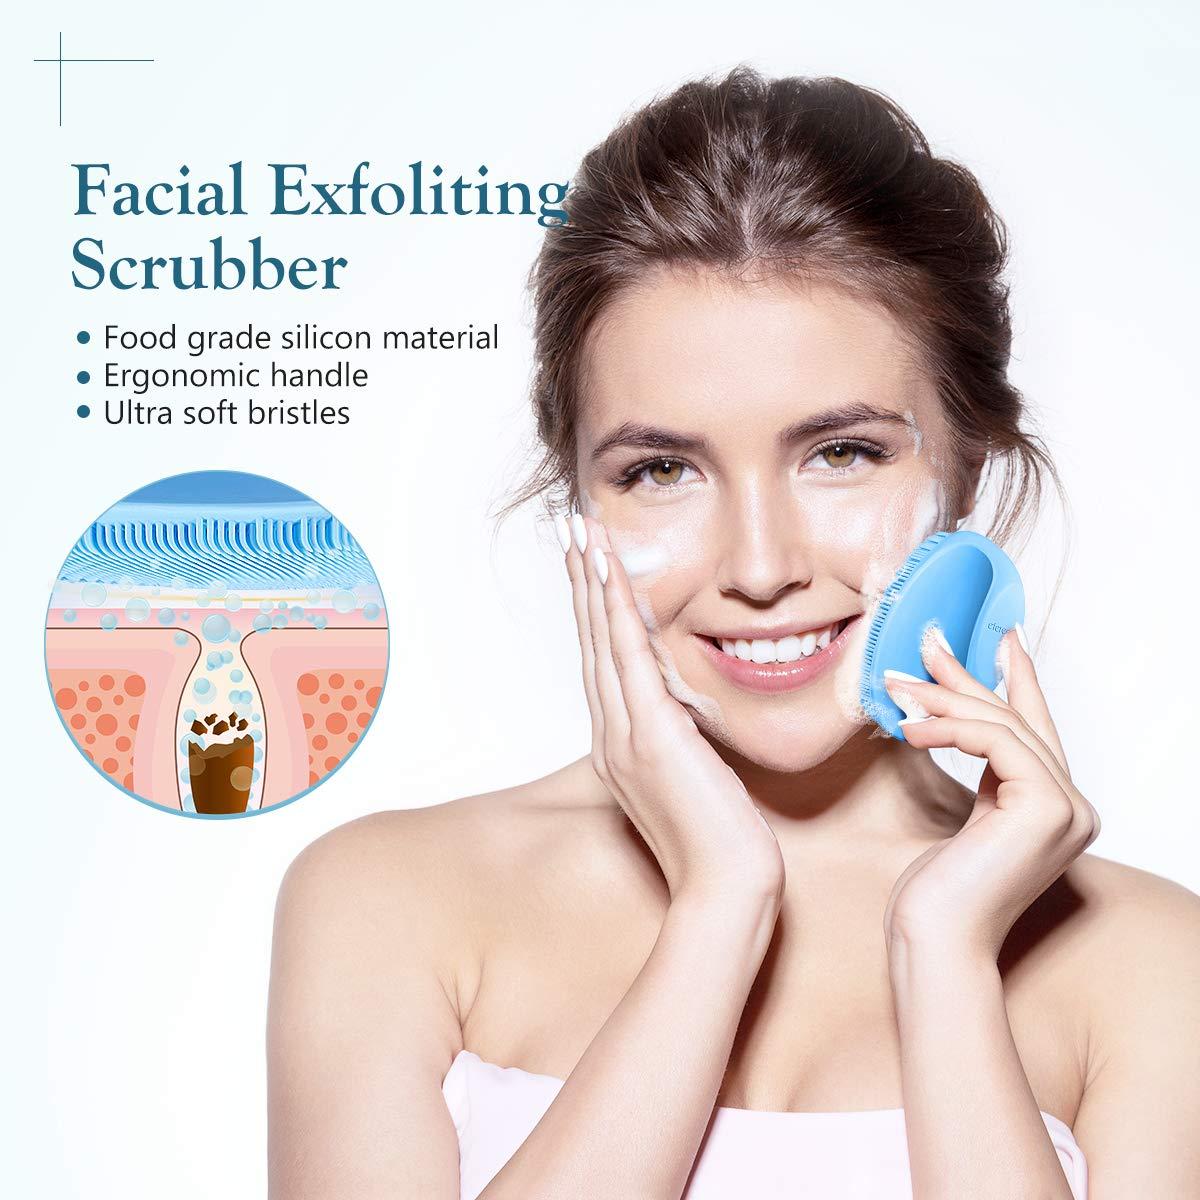 Reusable Cotton Pads for Face & Face Scrubber, Reusable Makeup Remover Pads Silicone Face Scrubber Set (16 Pack)